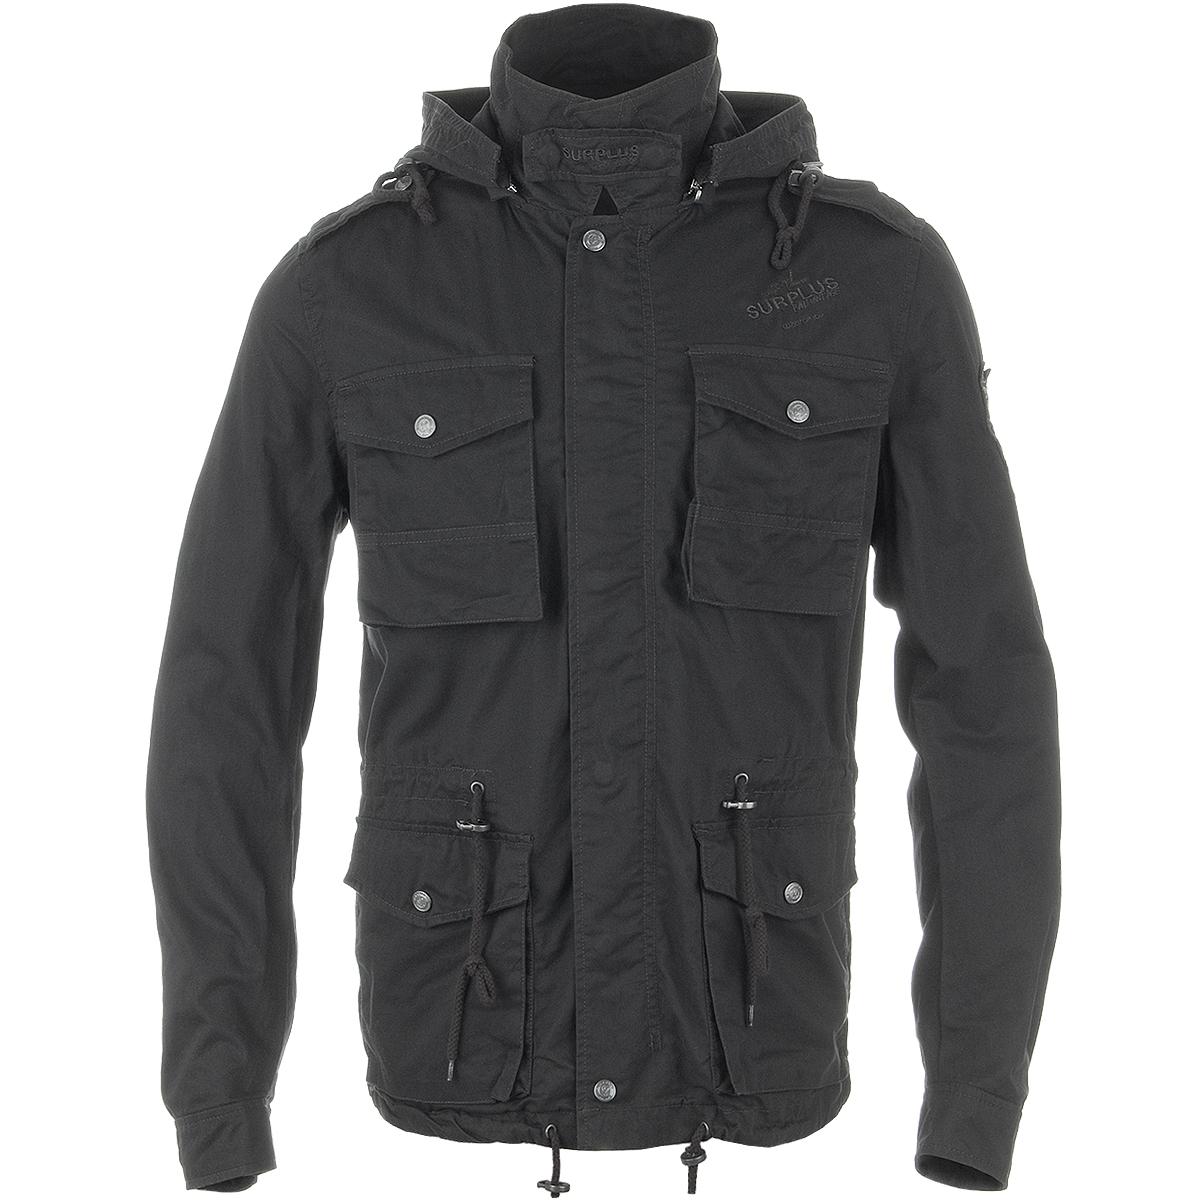 Surplus Military Jacket Army Style Coat Mens Combat Parka With Hood Cotton Black Ebay